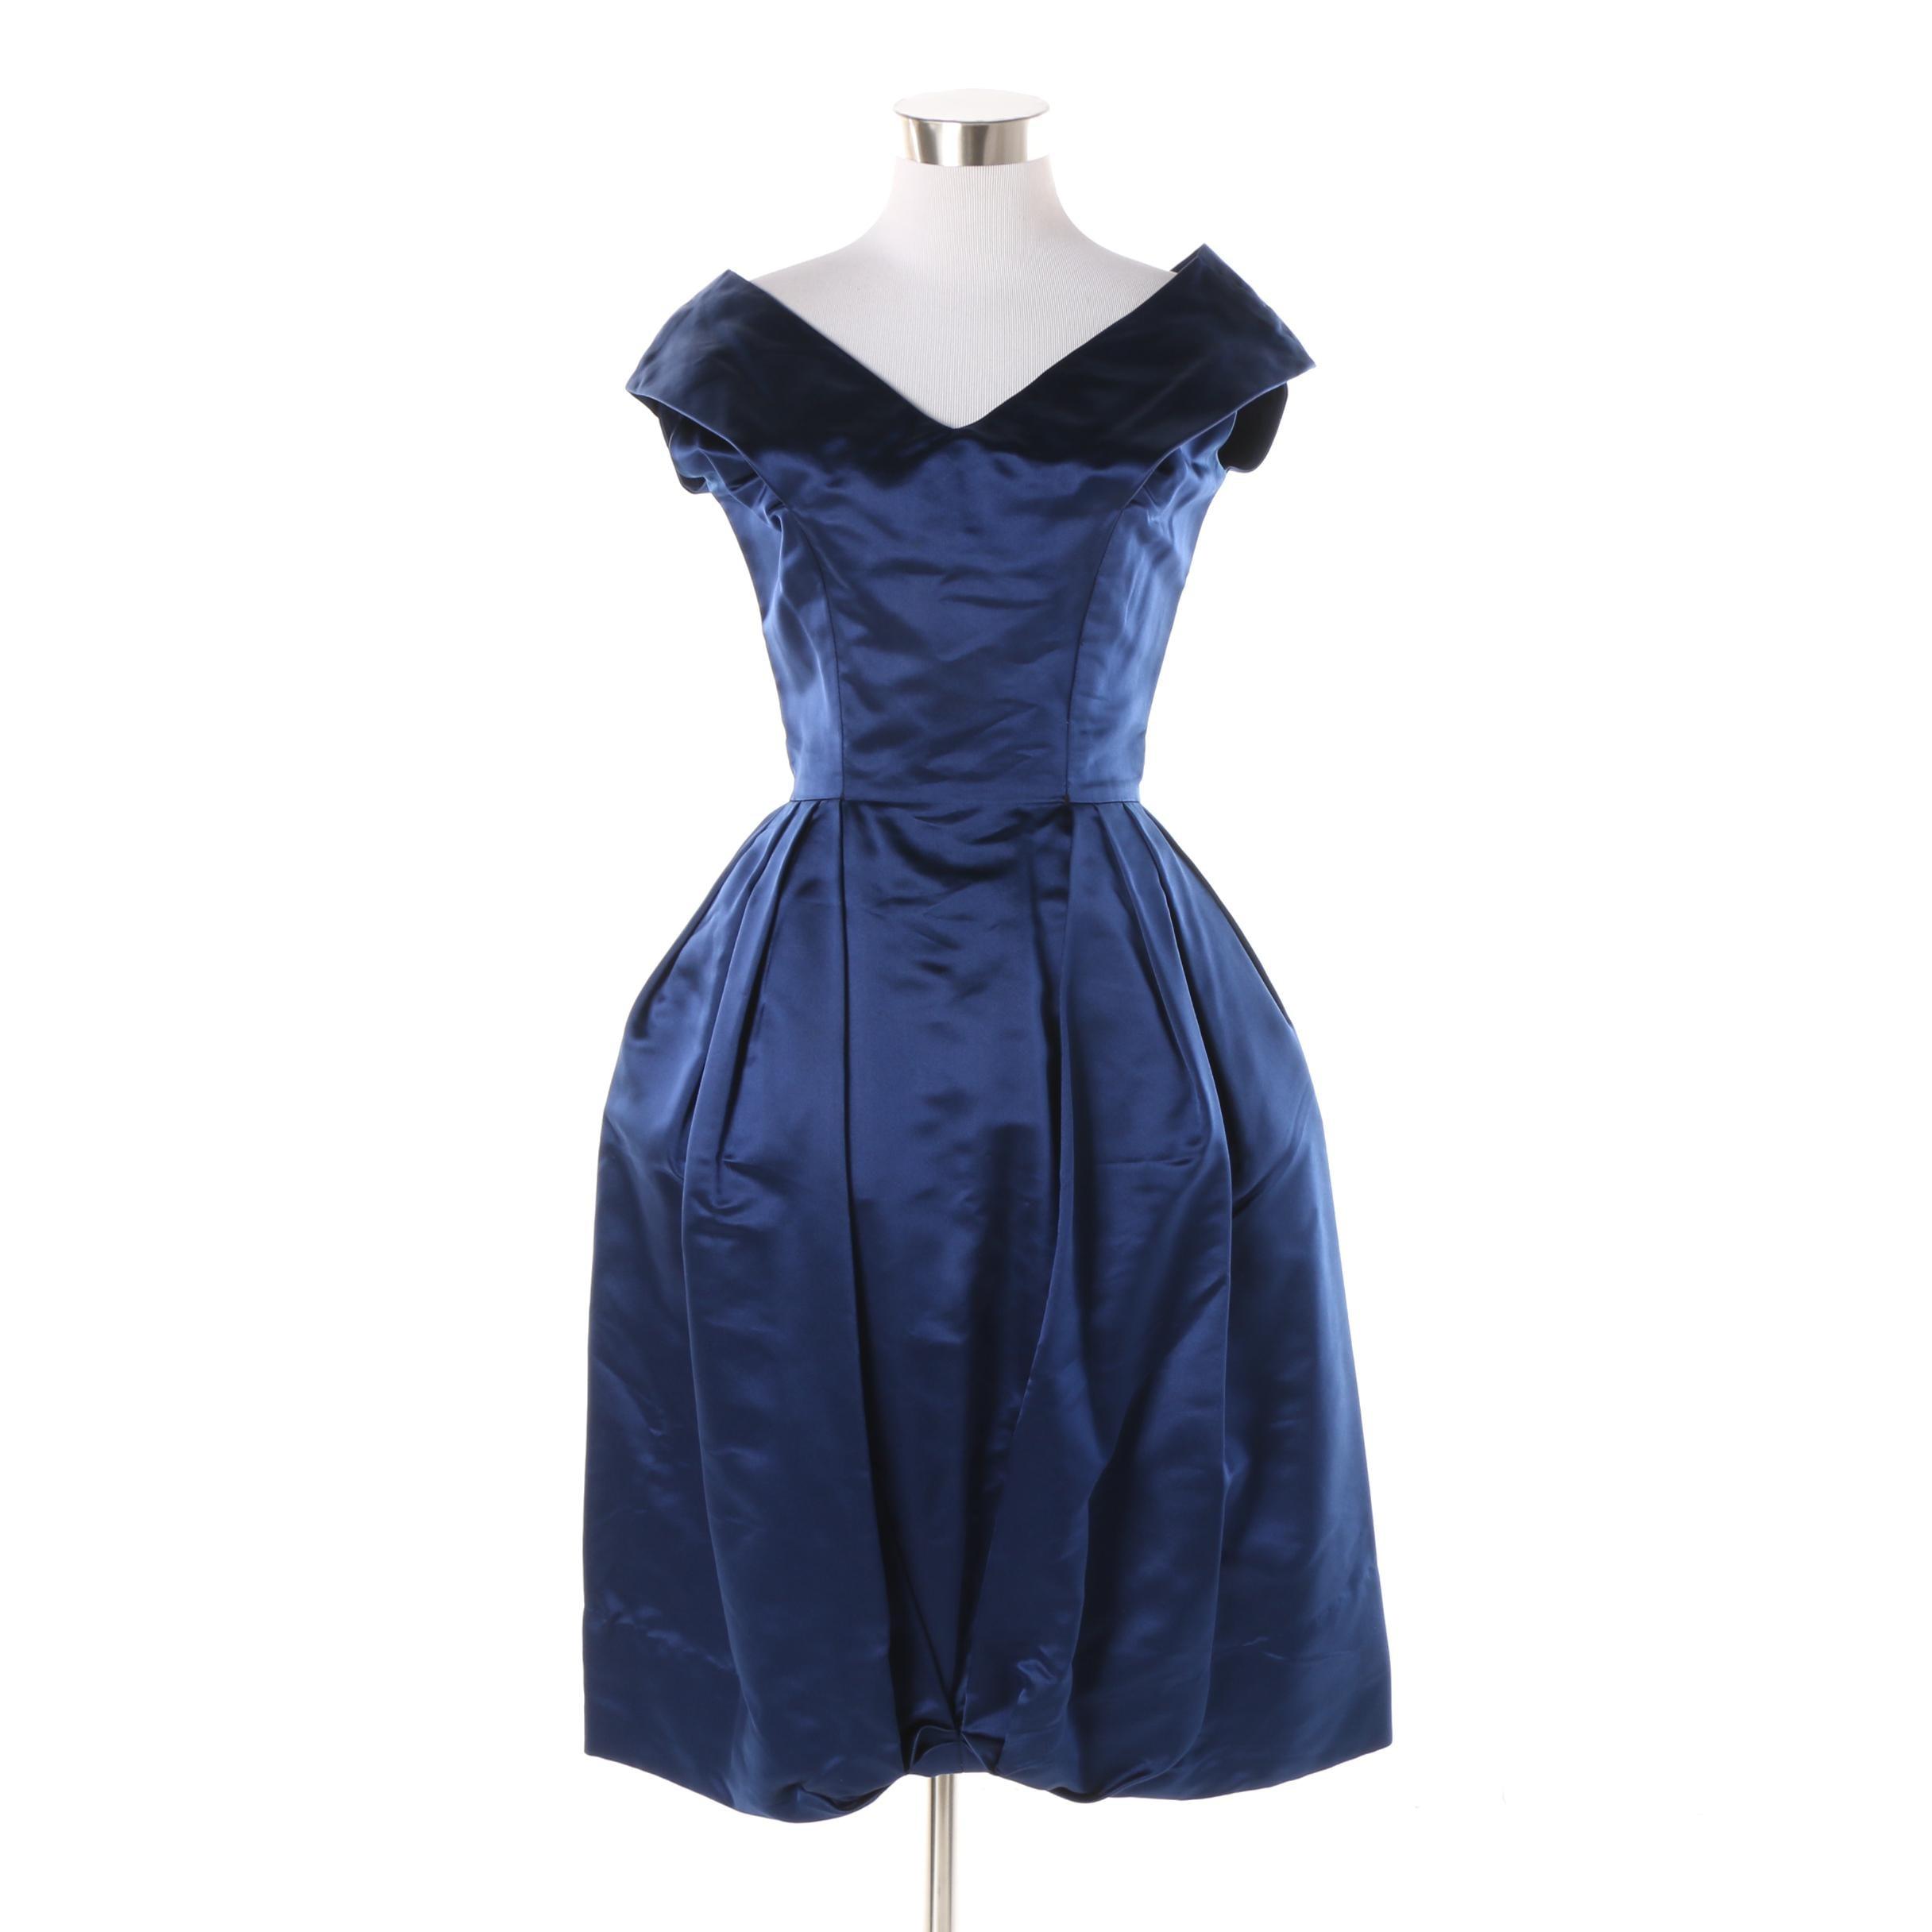 Circa 1960s Vintage Bramson Blue Cocktail Dress